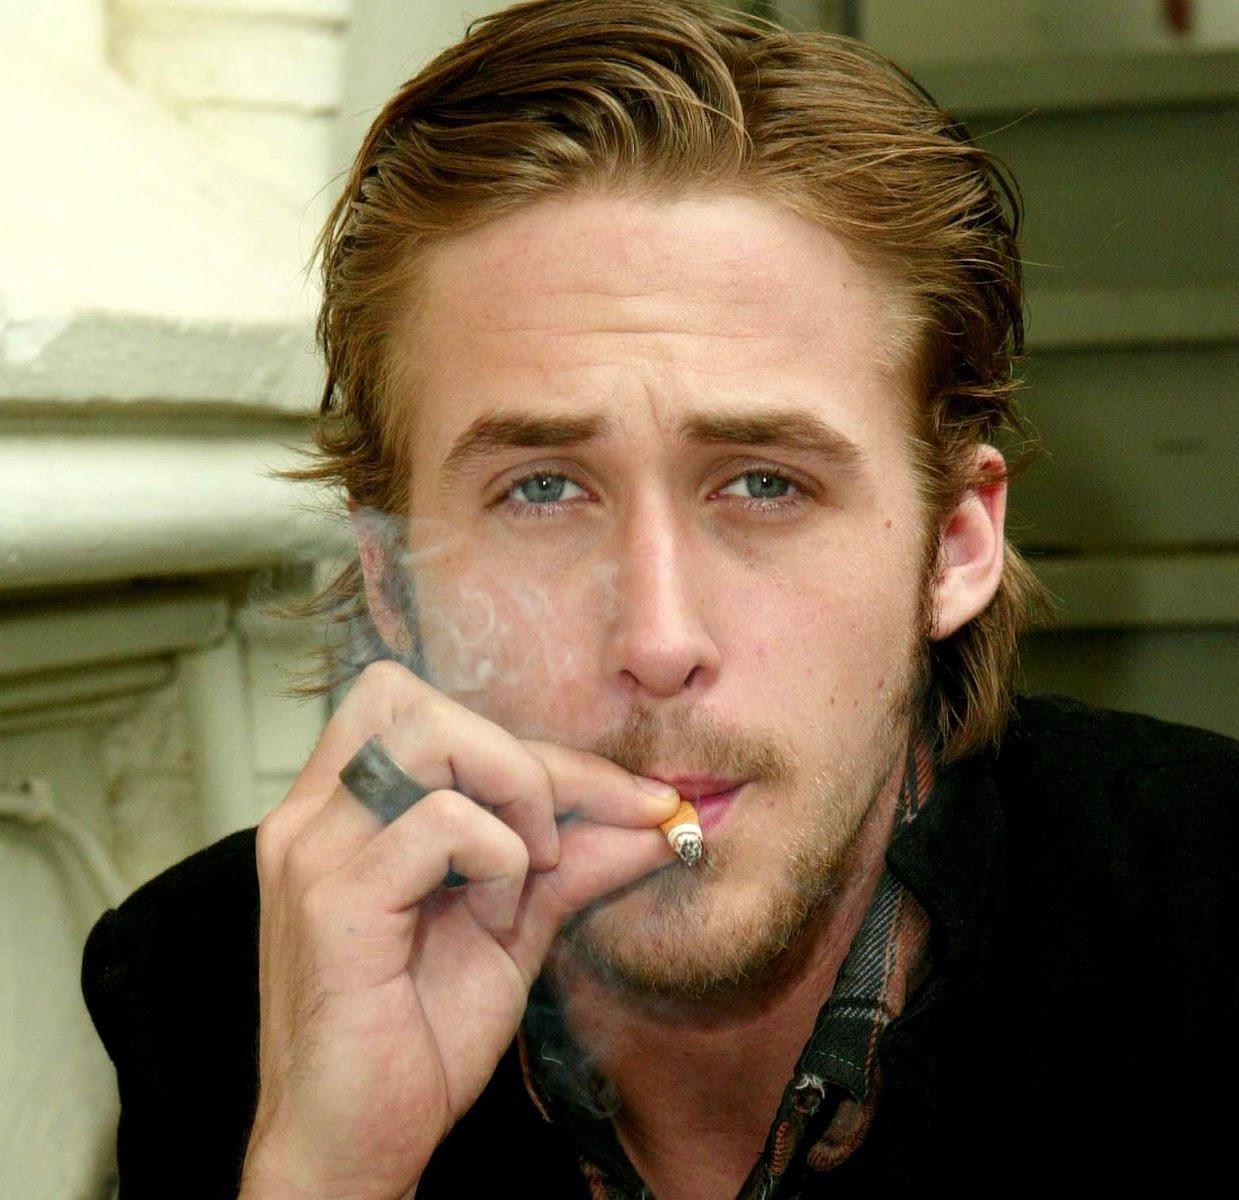 Risultati immagini per ryan gosling